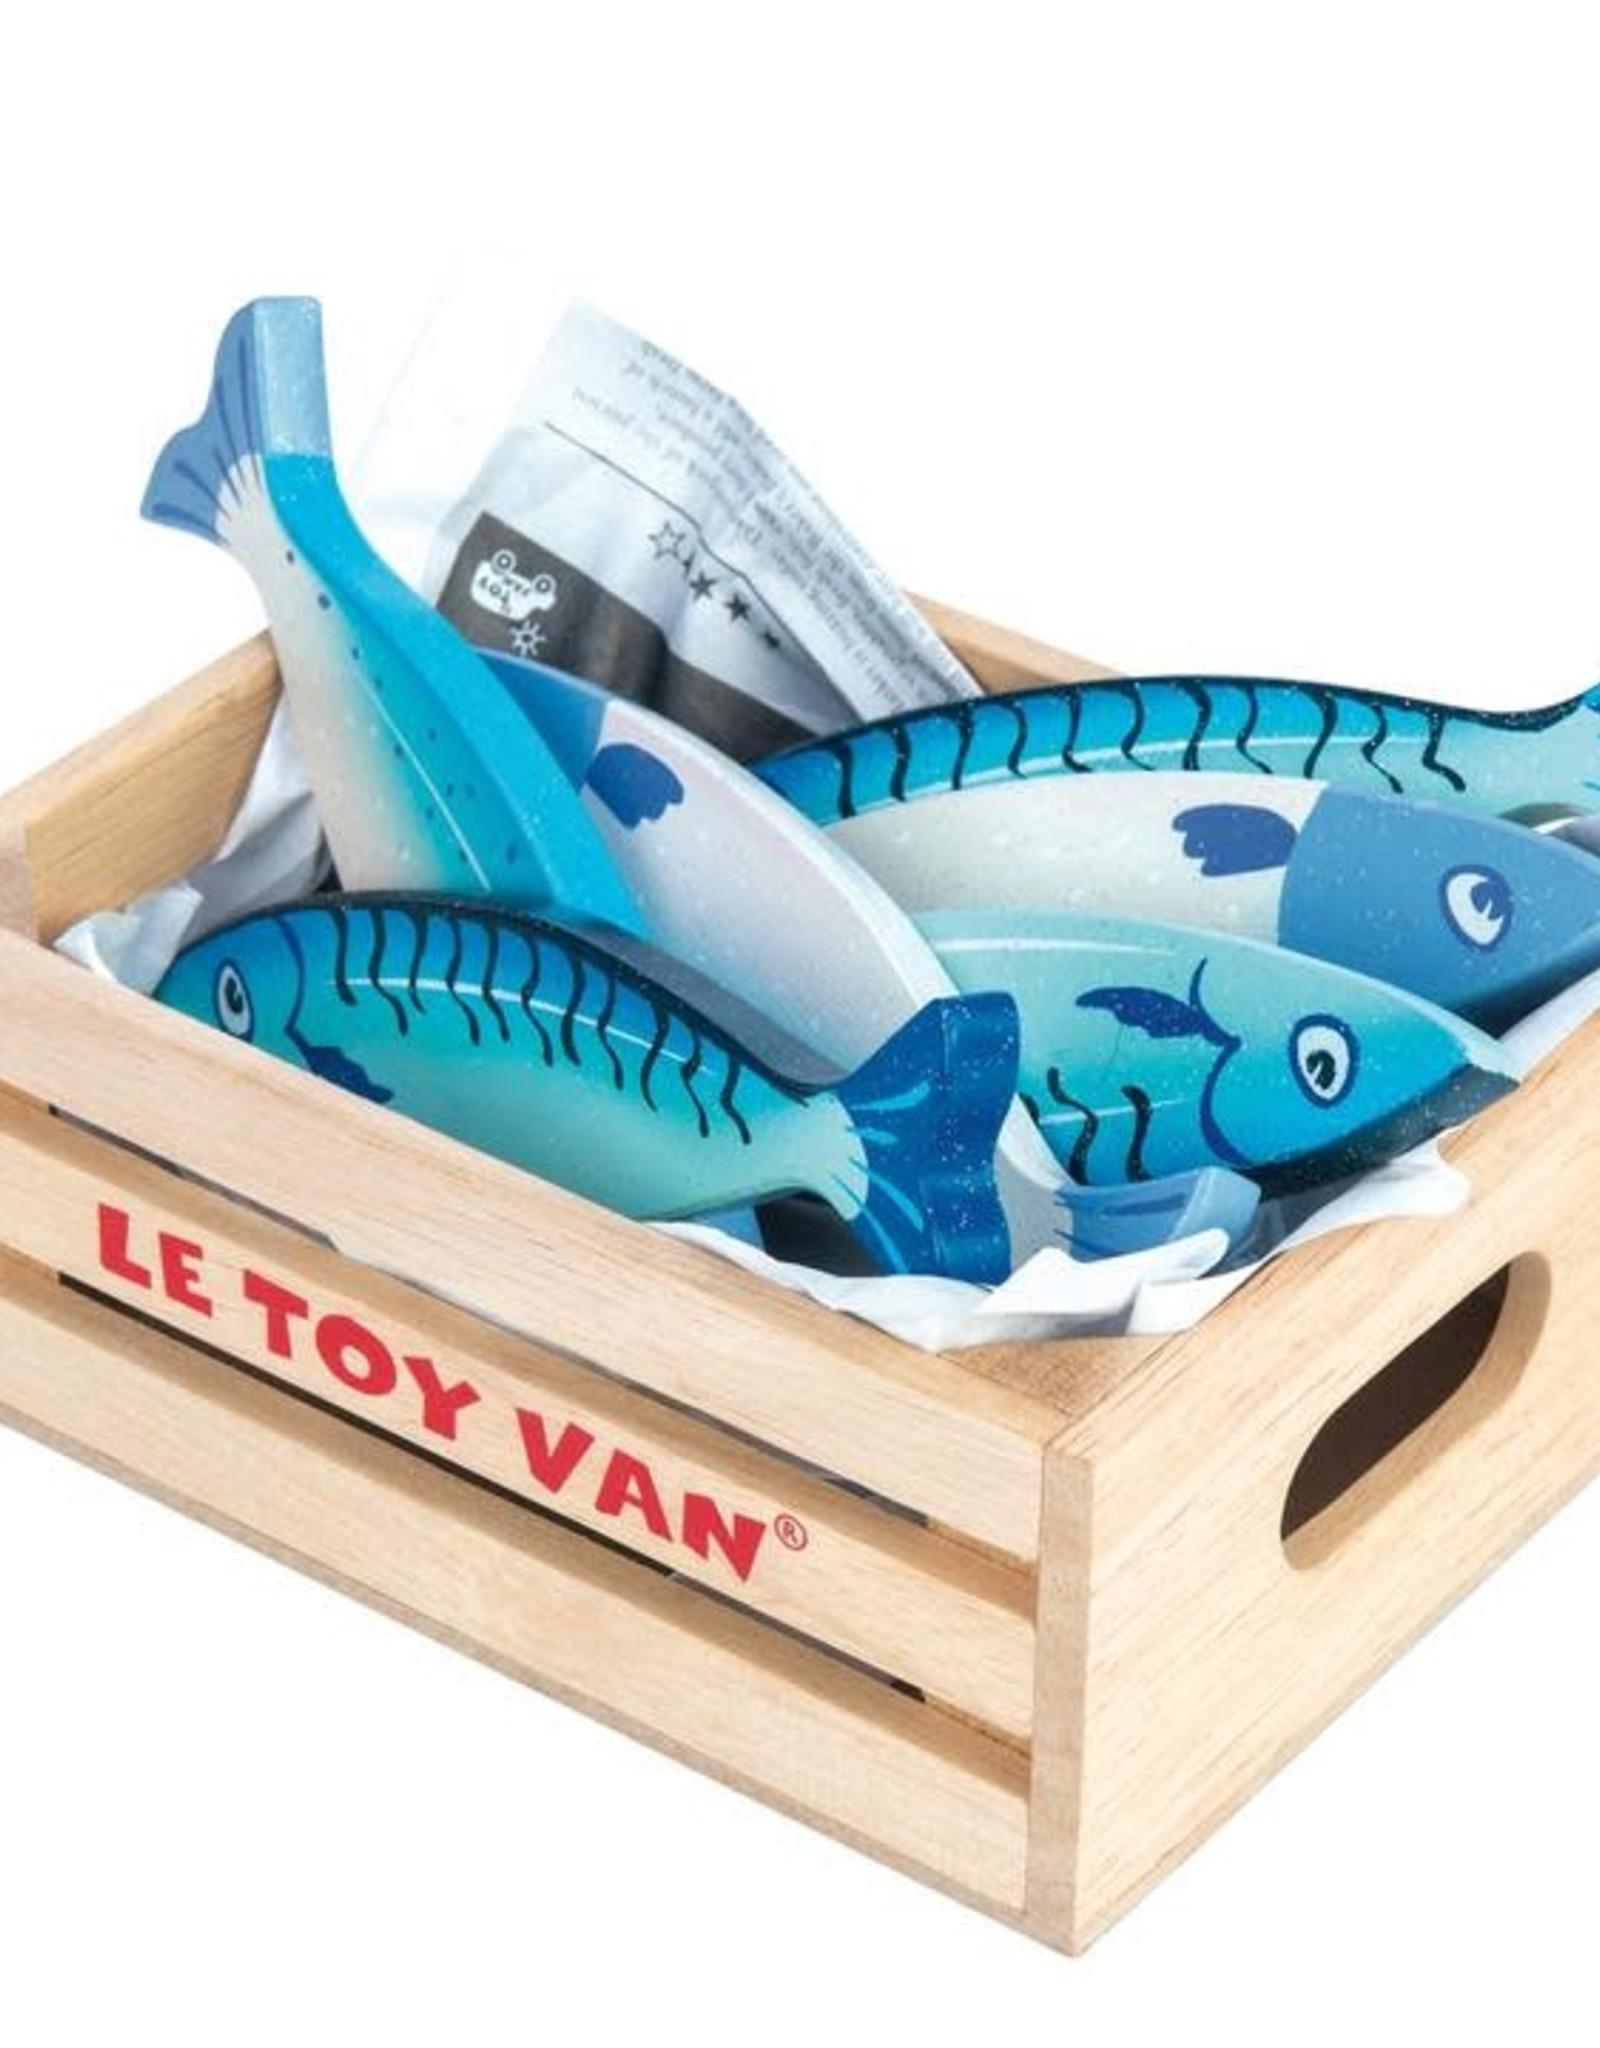 Le Toy Van Le Toy Van - Fresh Fish Basket